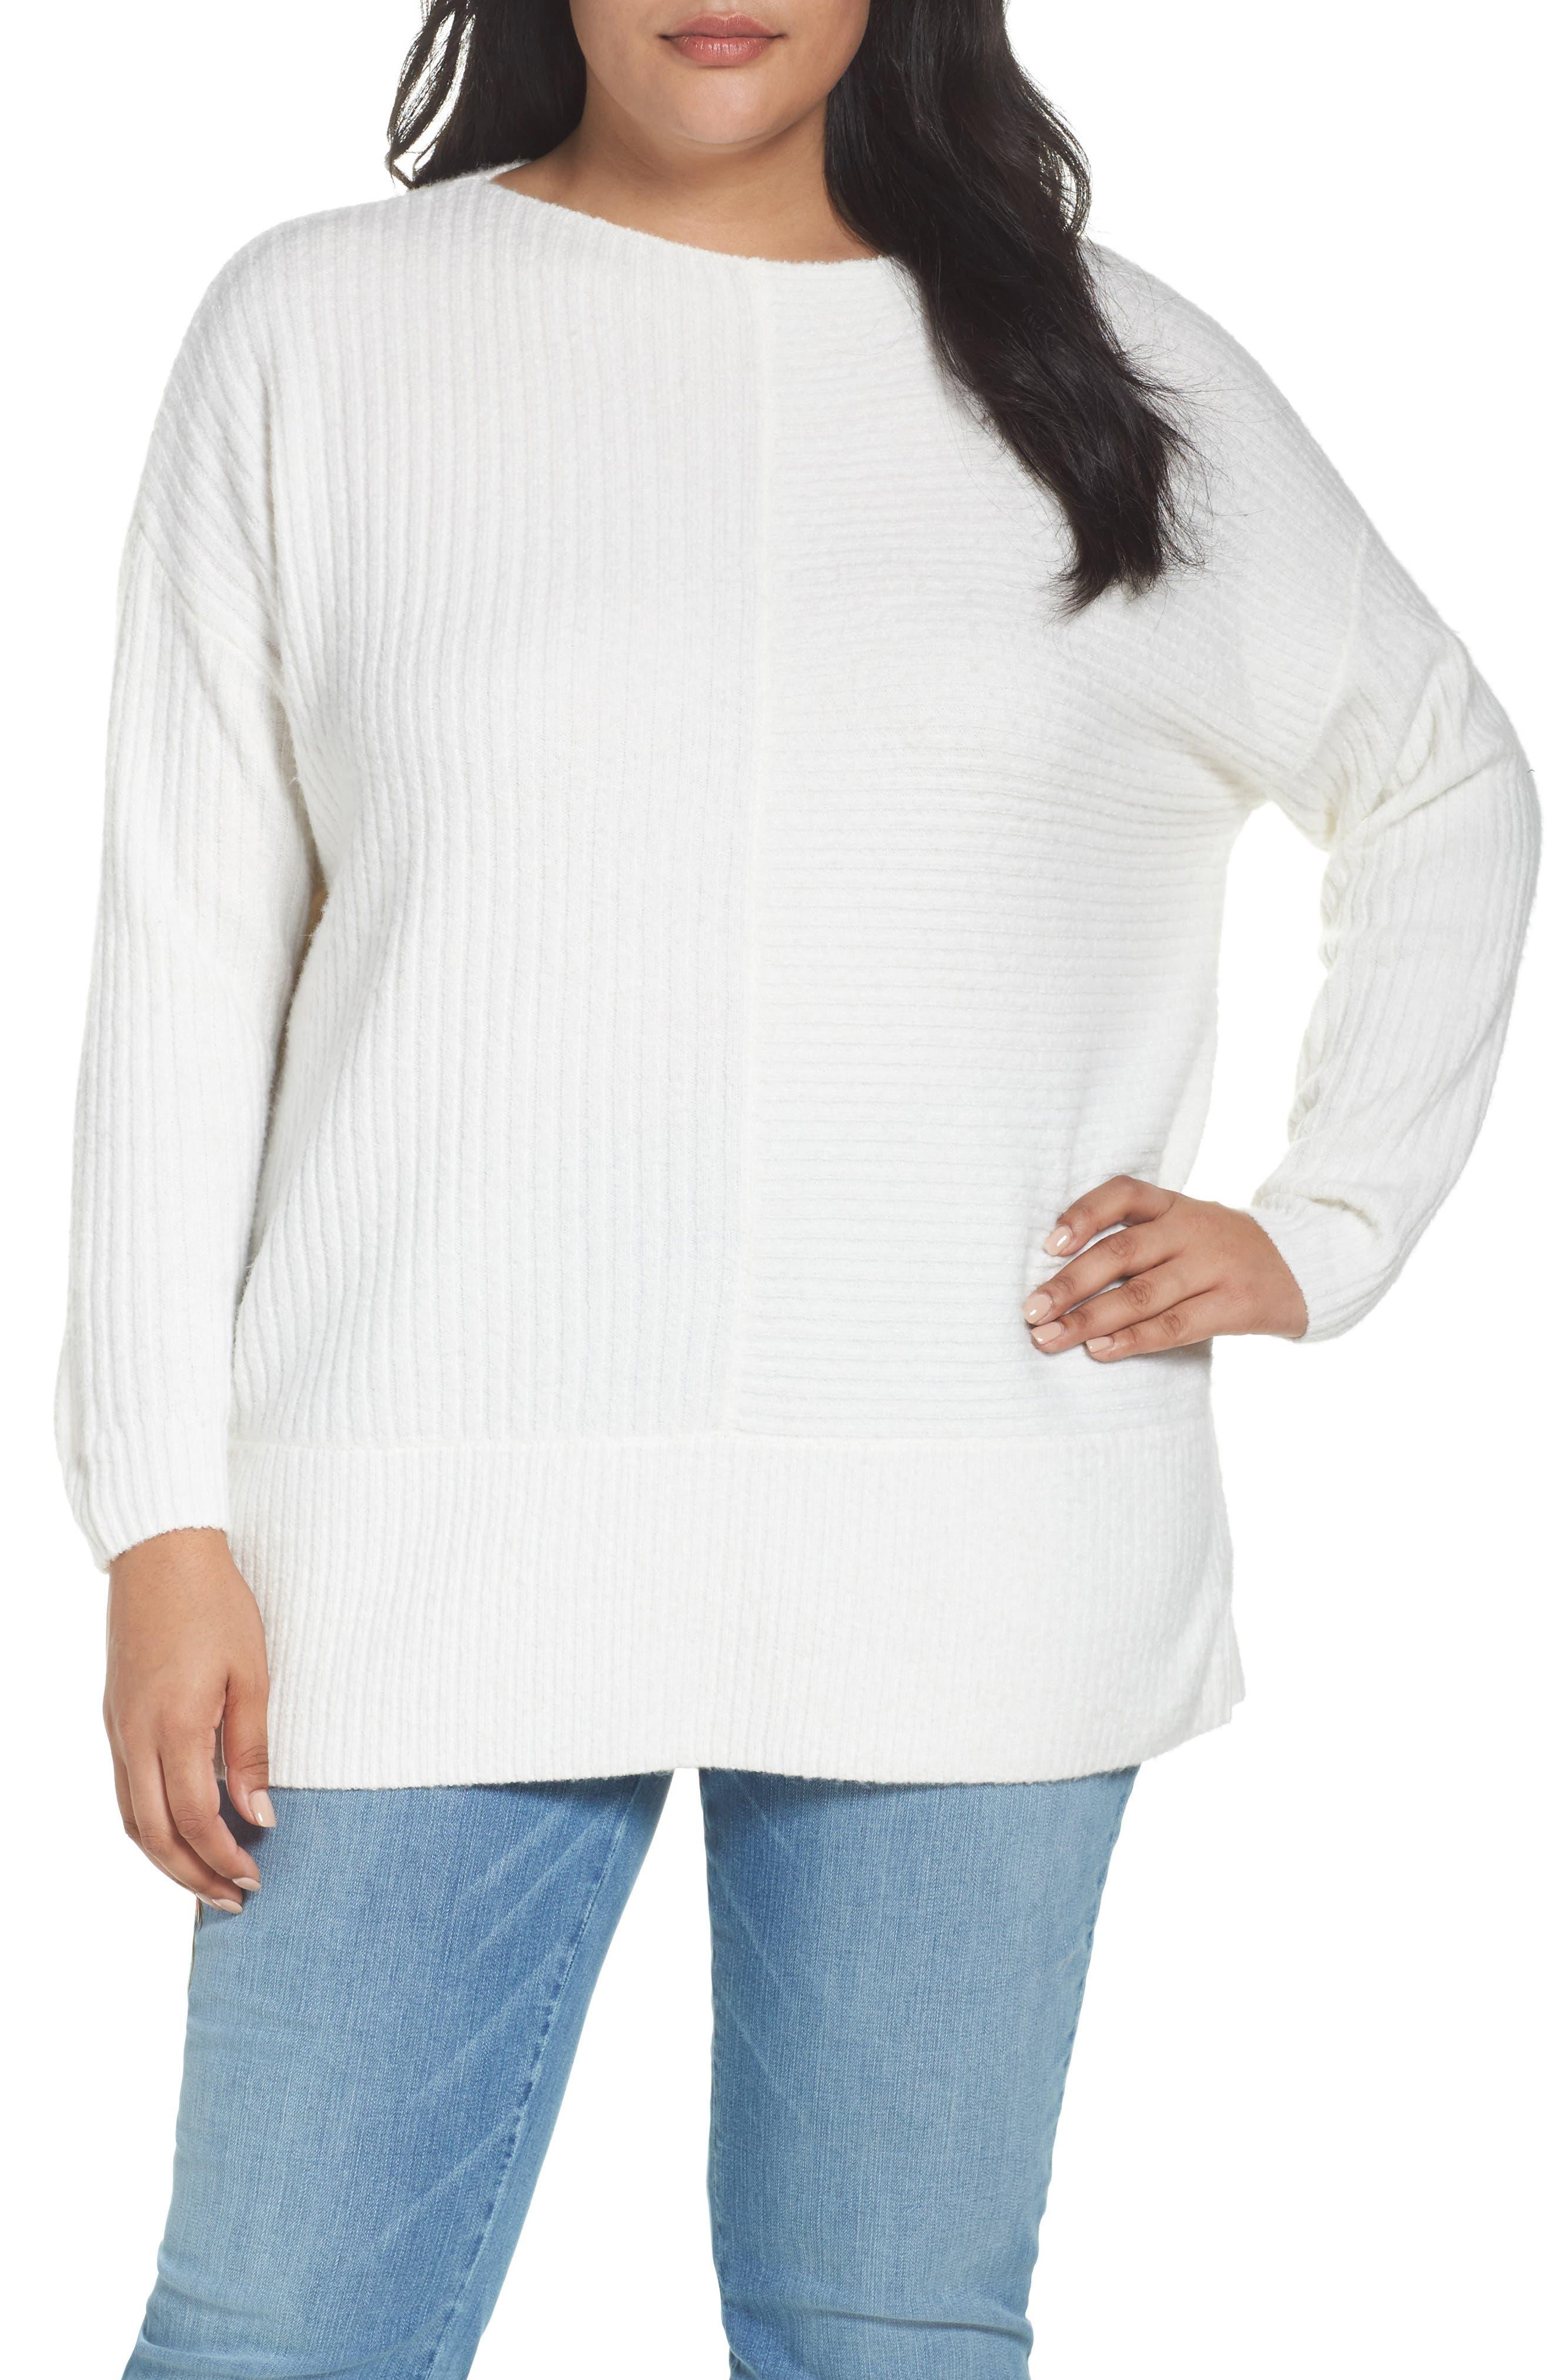 Caslon® Mixed Stitch Bateau Neck Sweater (Plus Size)